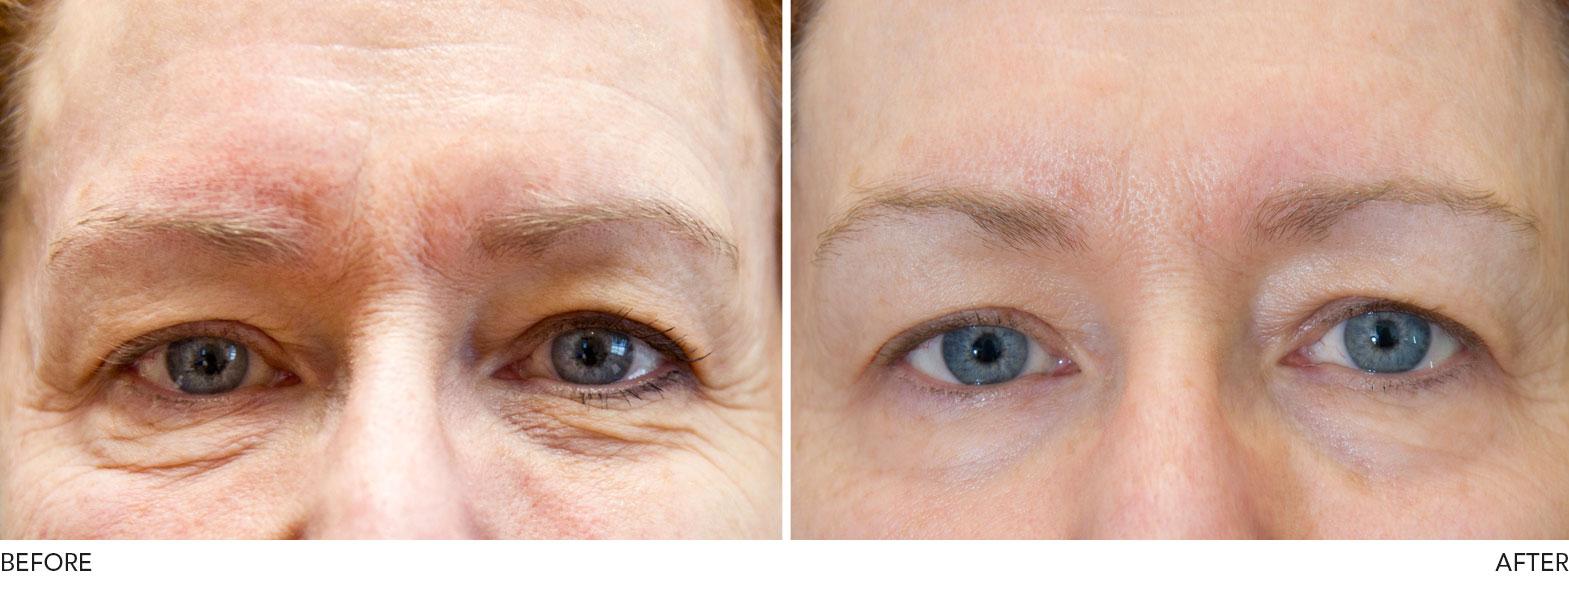 Exilis Elite Skin Tightening Cosmetic Clinic Burnley